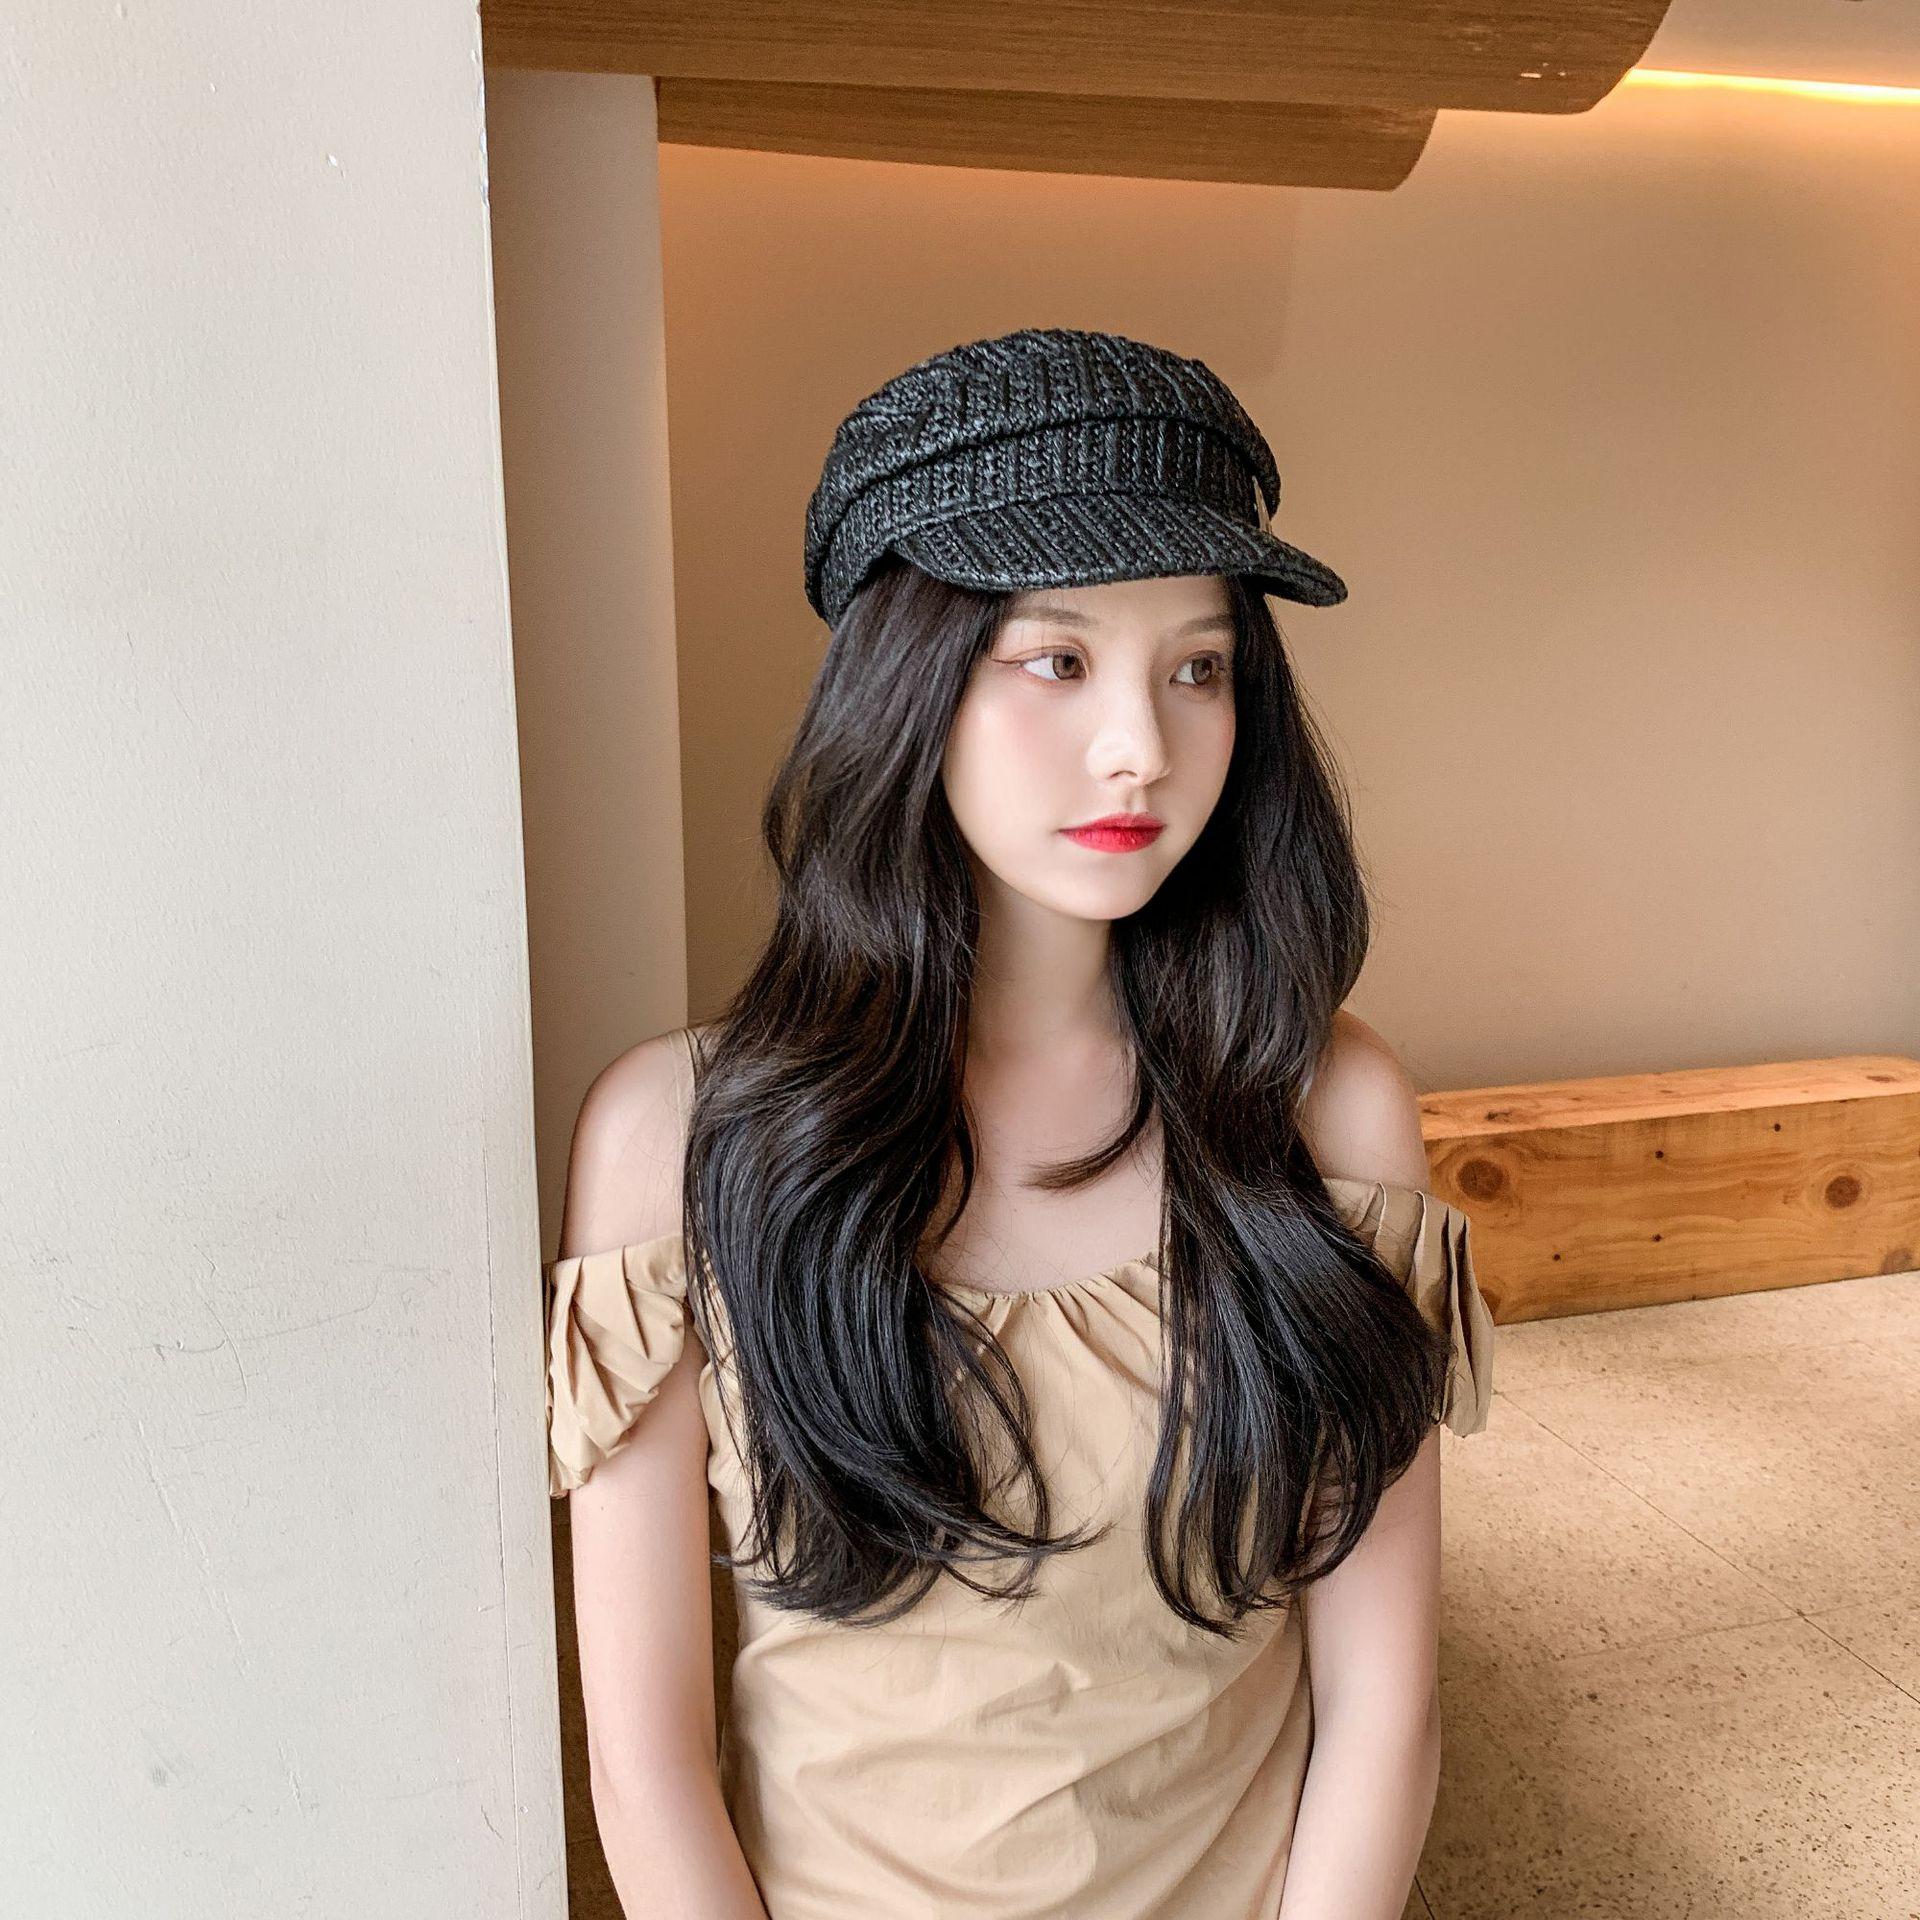 2021 New Retro Peaked Hat Fashion Straw Hat Female British Korean Version Japanese Beret Simple and Fashionable